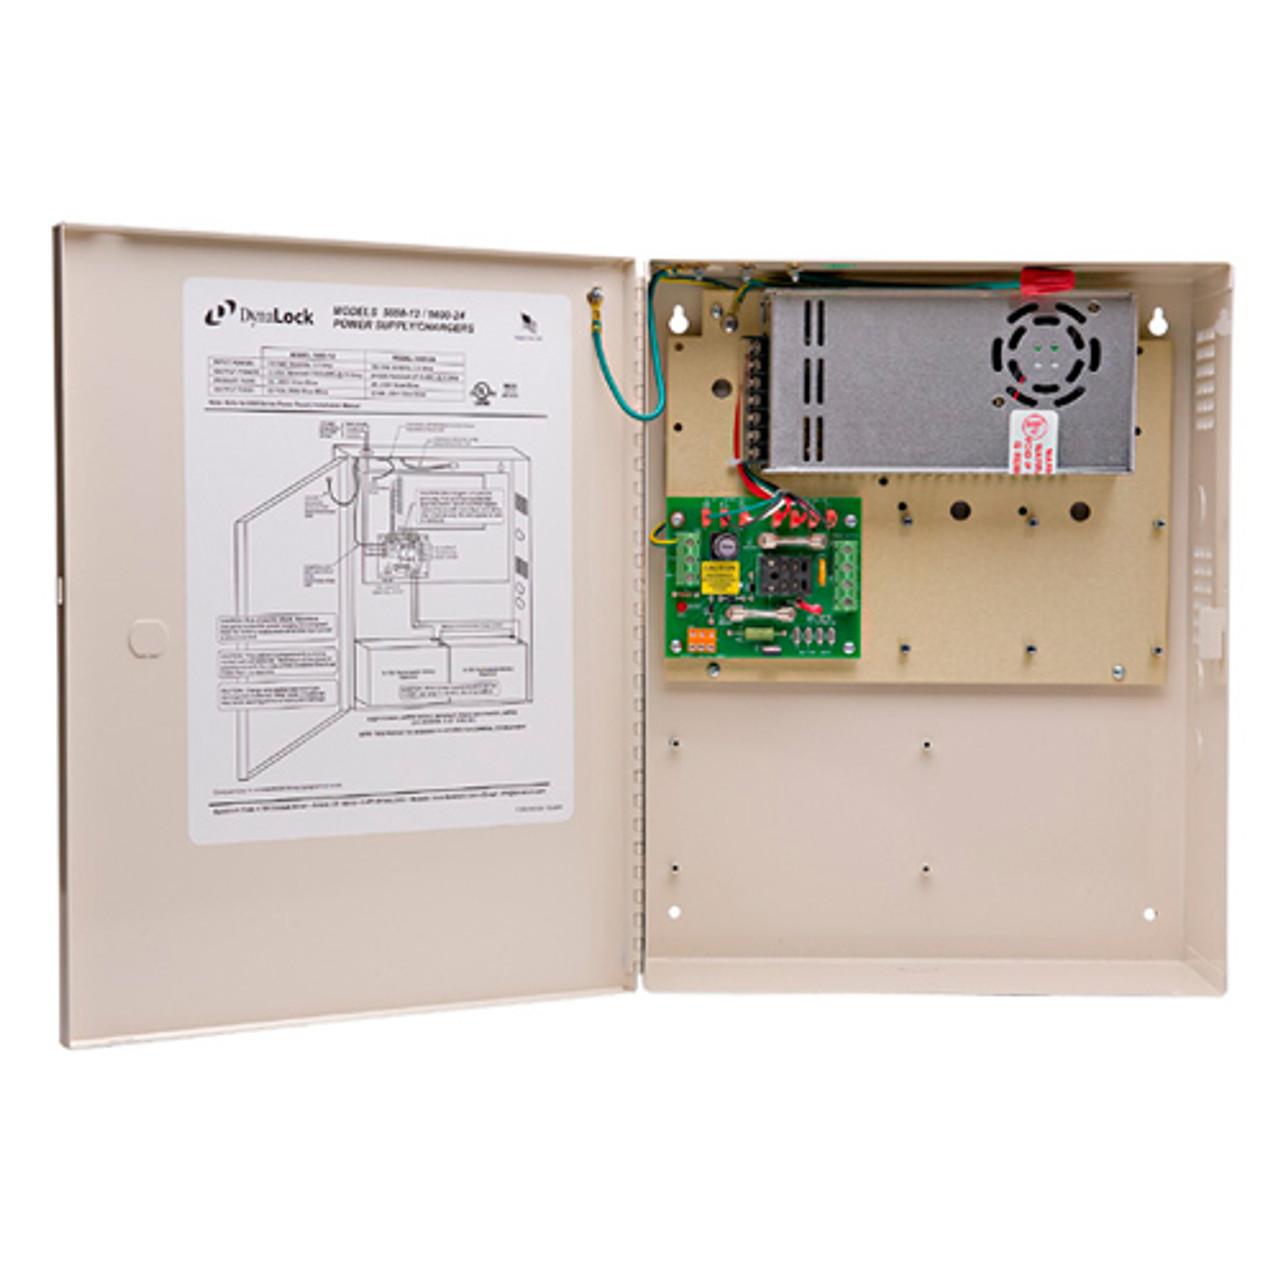 hight resolution of 5600 12 ilb dynalock multi zone heavy duty 12 vdc power supply with interlock logic board lock depot inc